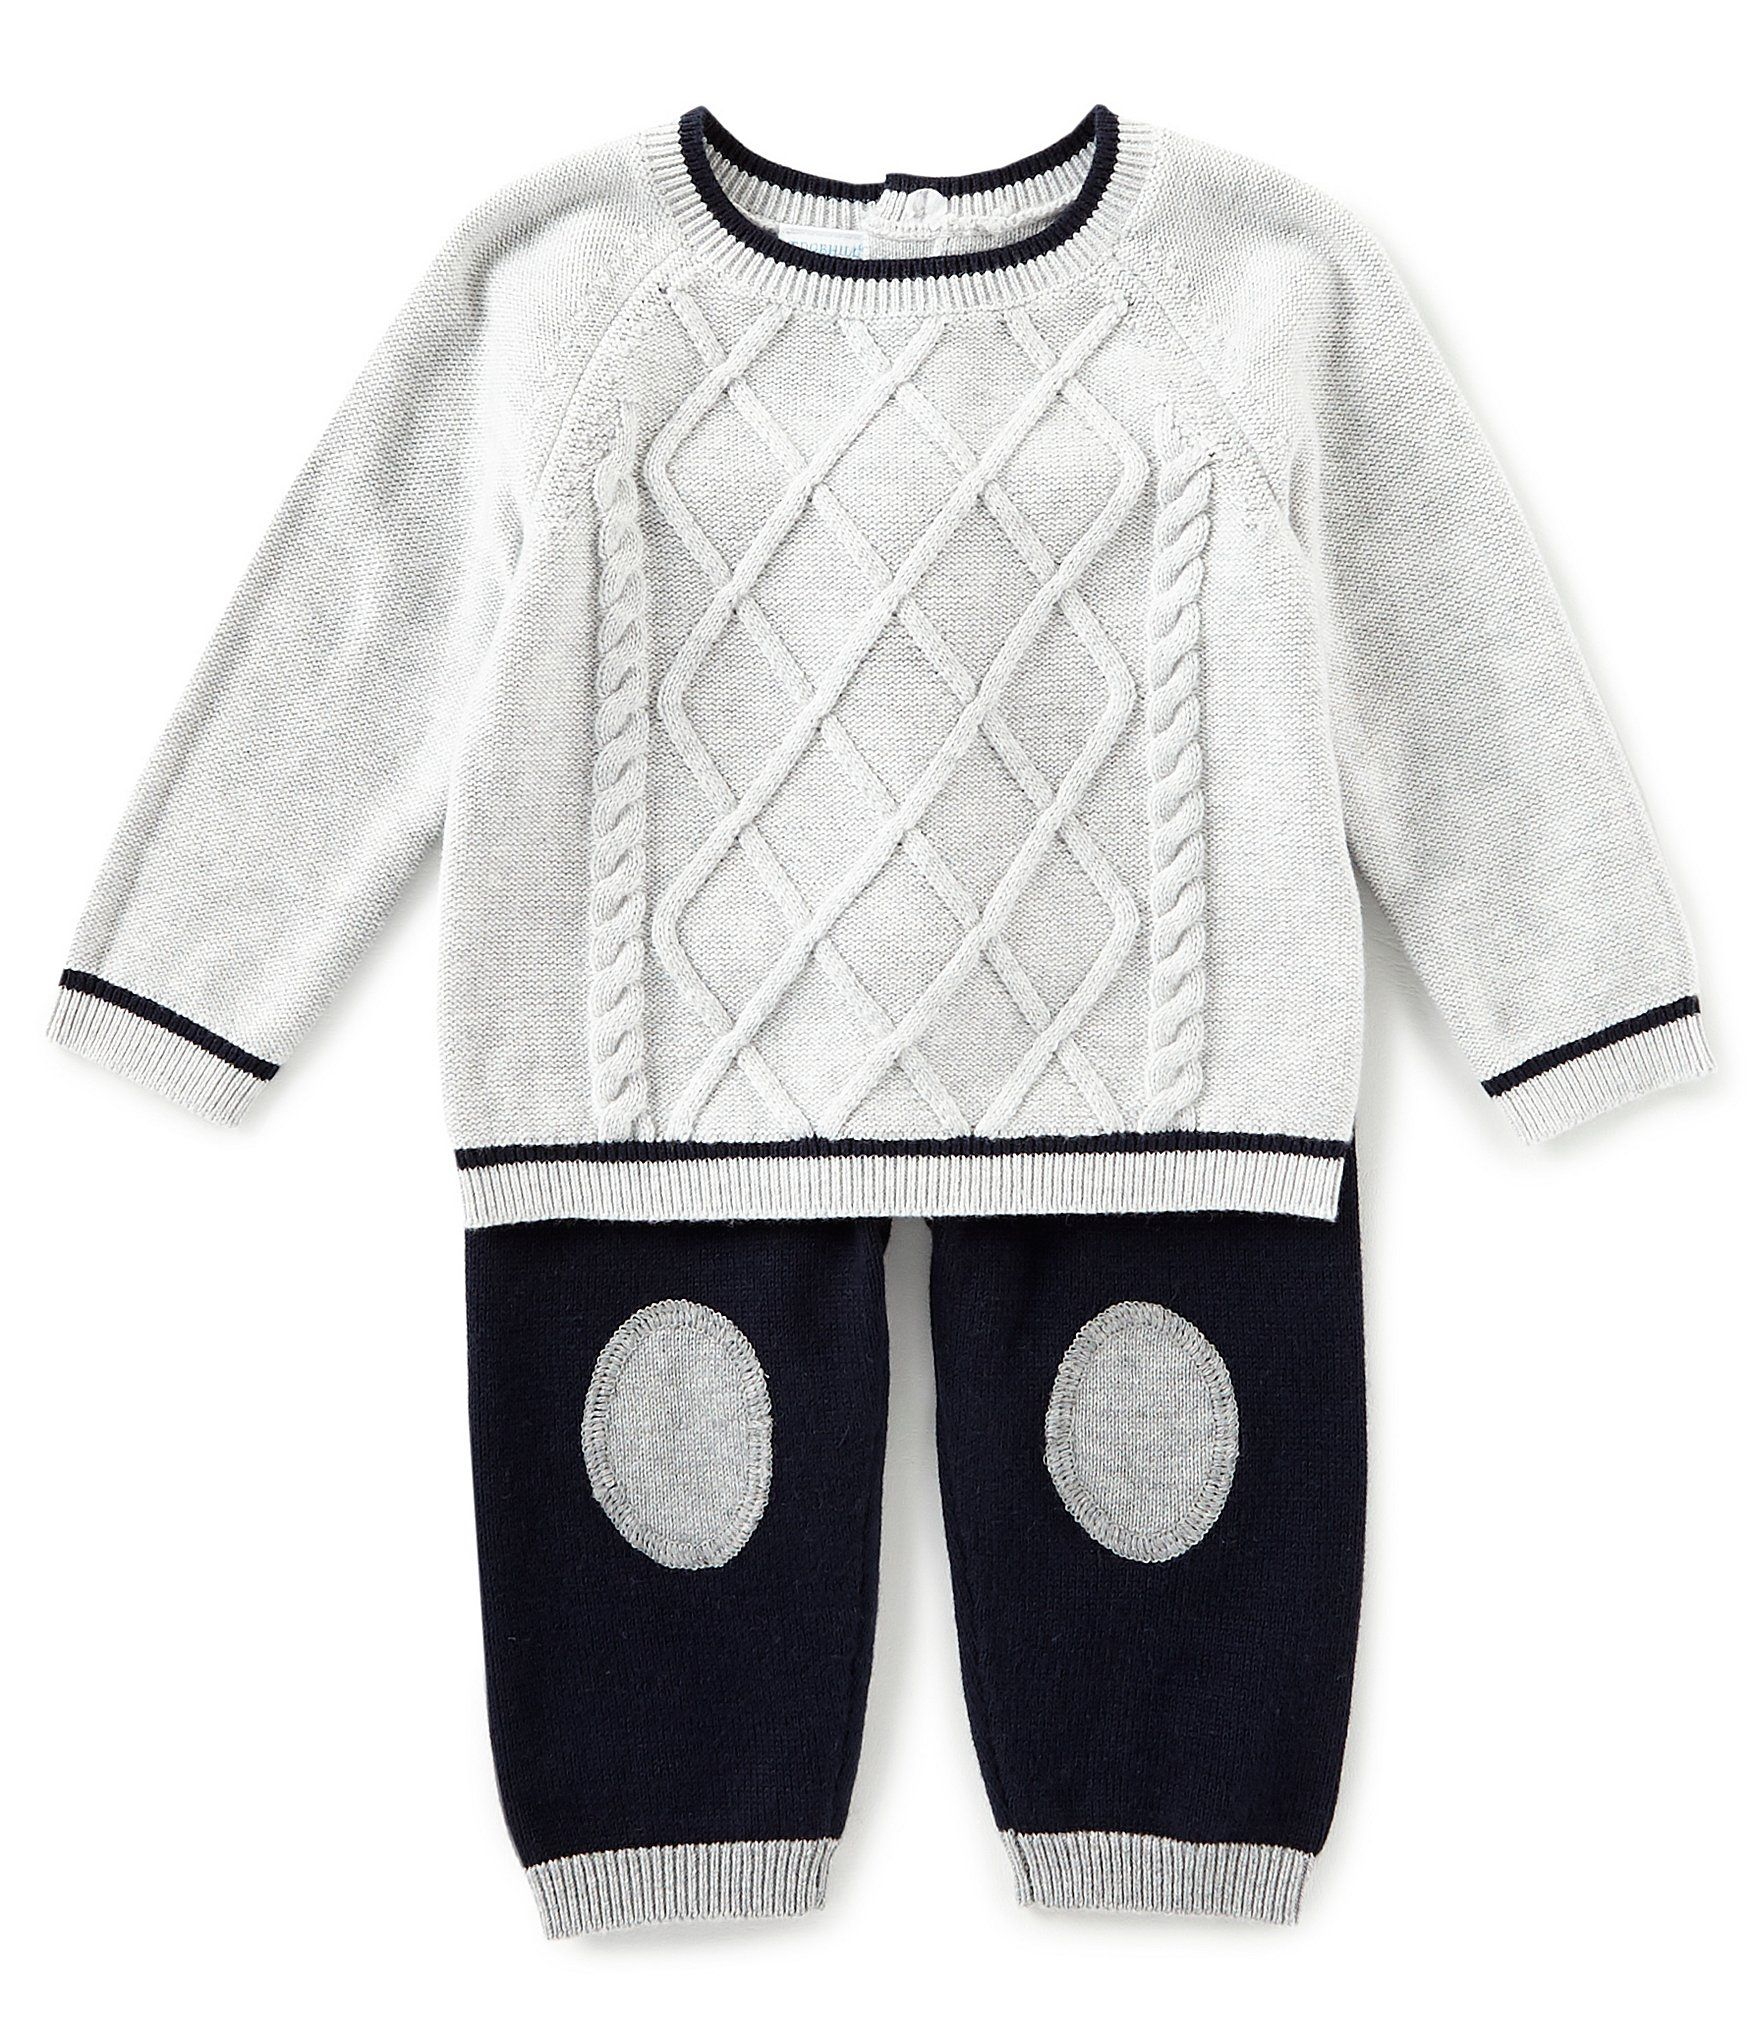 39c55ae50 Edgehill Collection Baby Boys Newborn-6 Months Long Sleeve Sweater ...